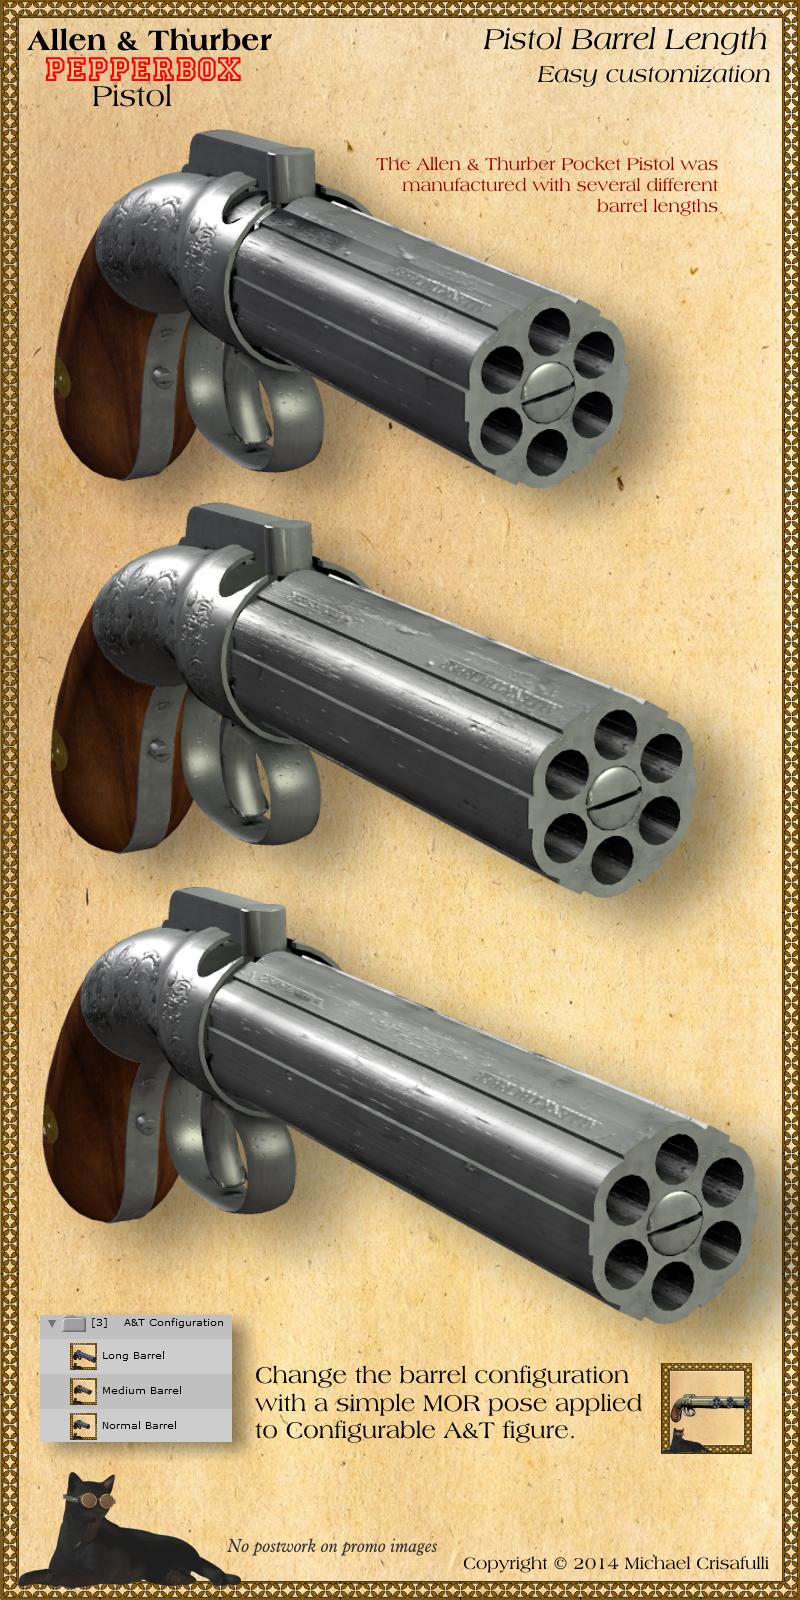 Allen & Thurber Pepperbox Pistol High Quality Background on Wallpapers Vista